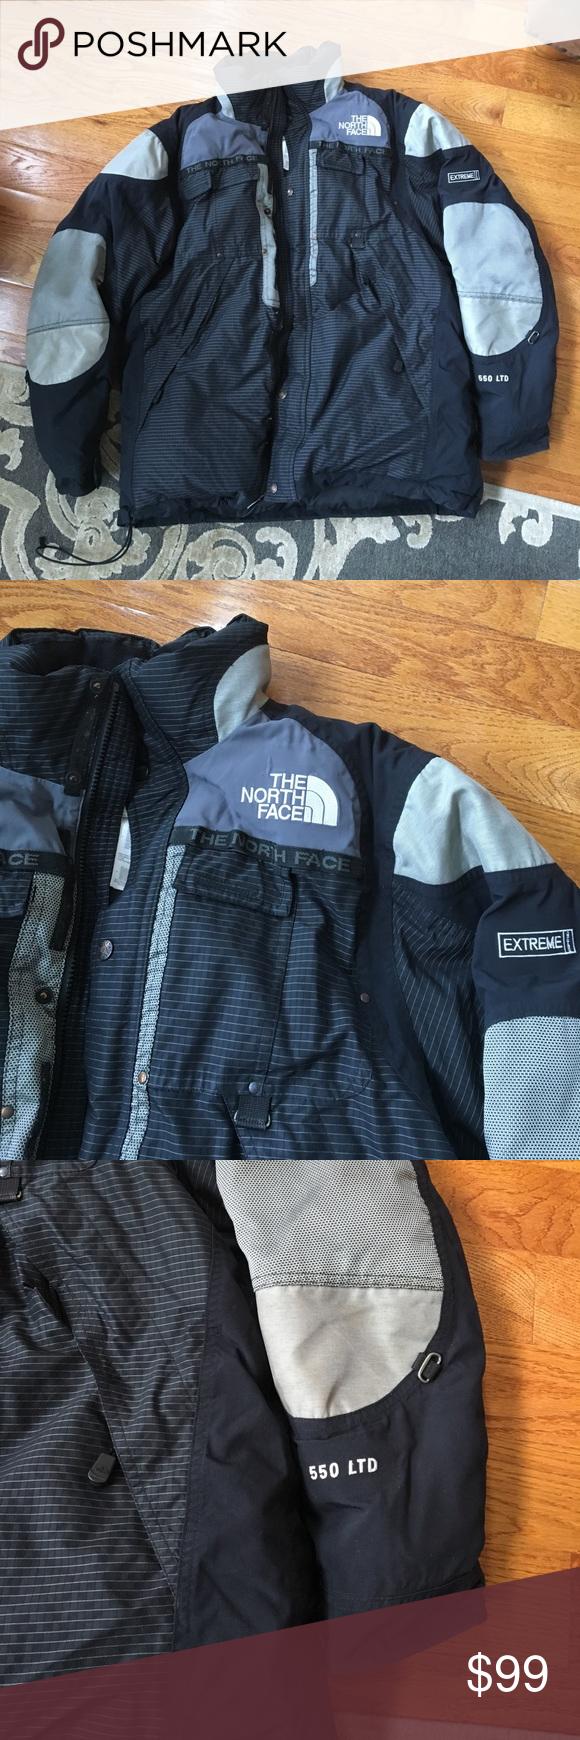 128855212 North face Extreme 550 ltd men M jacket rare Very worn. But still in ...